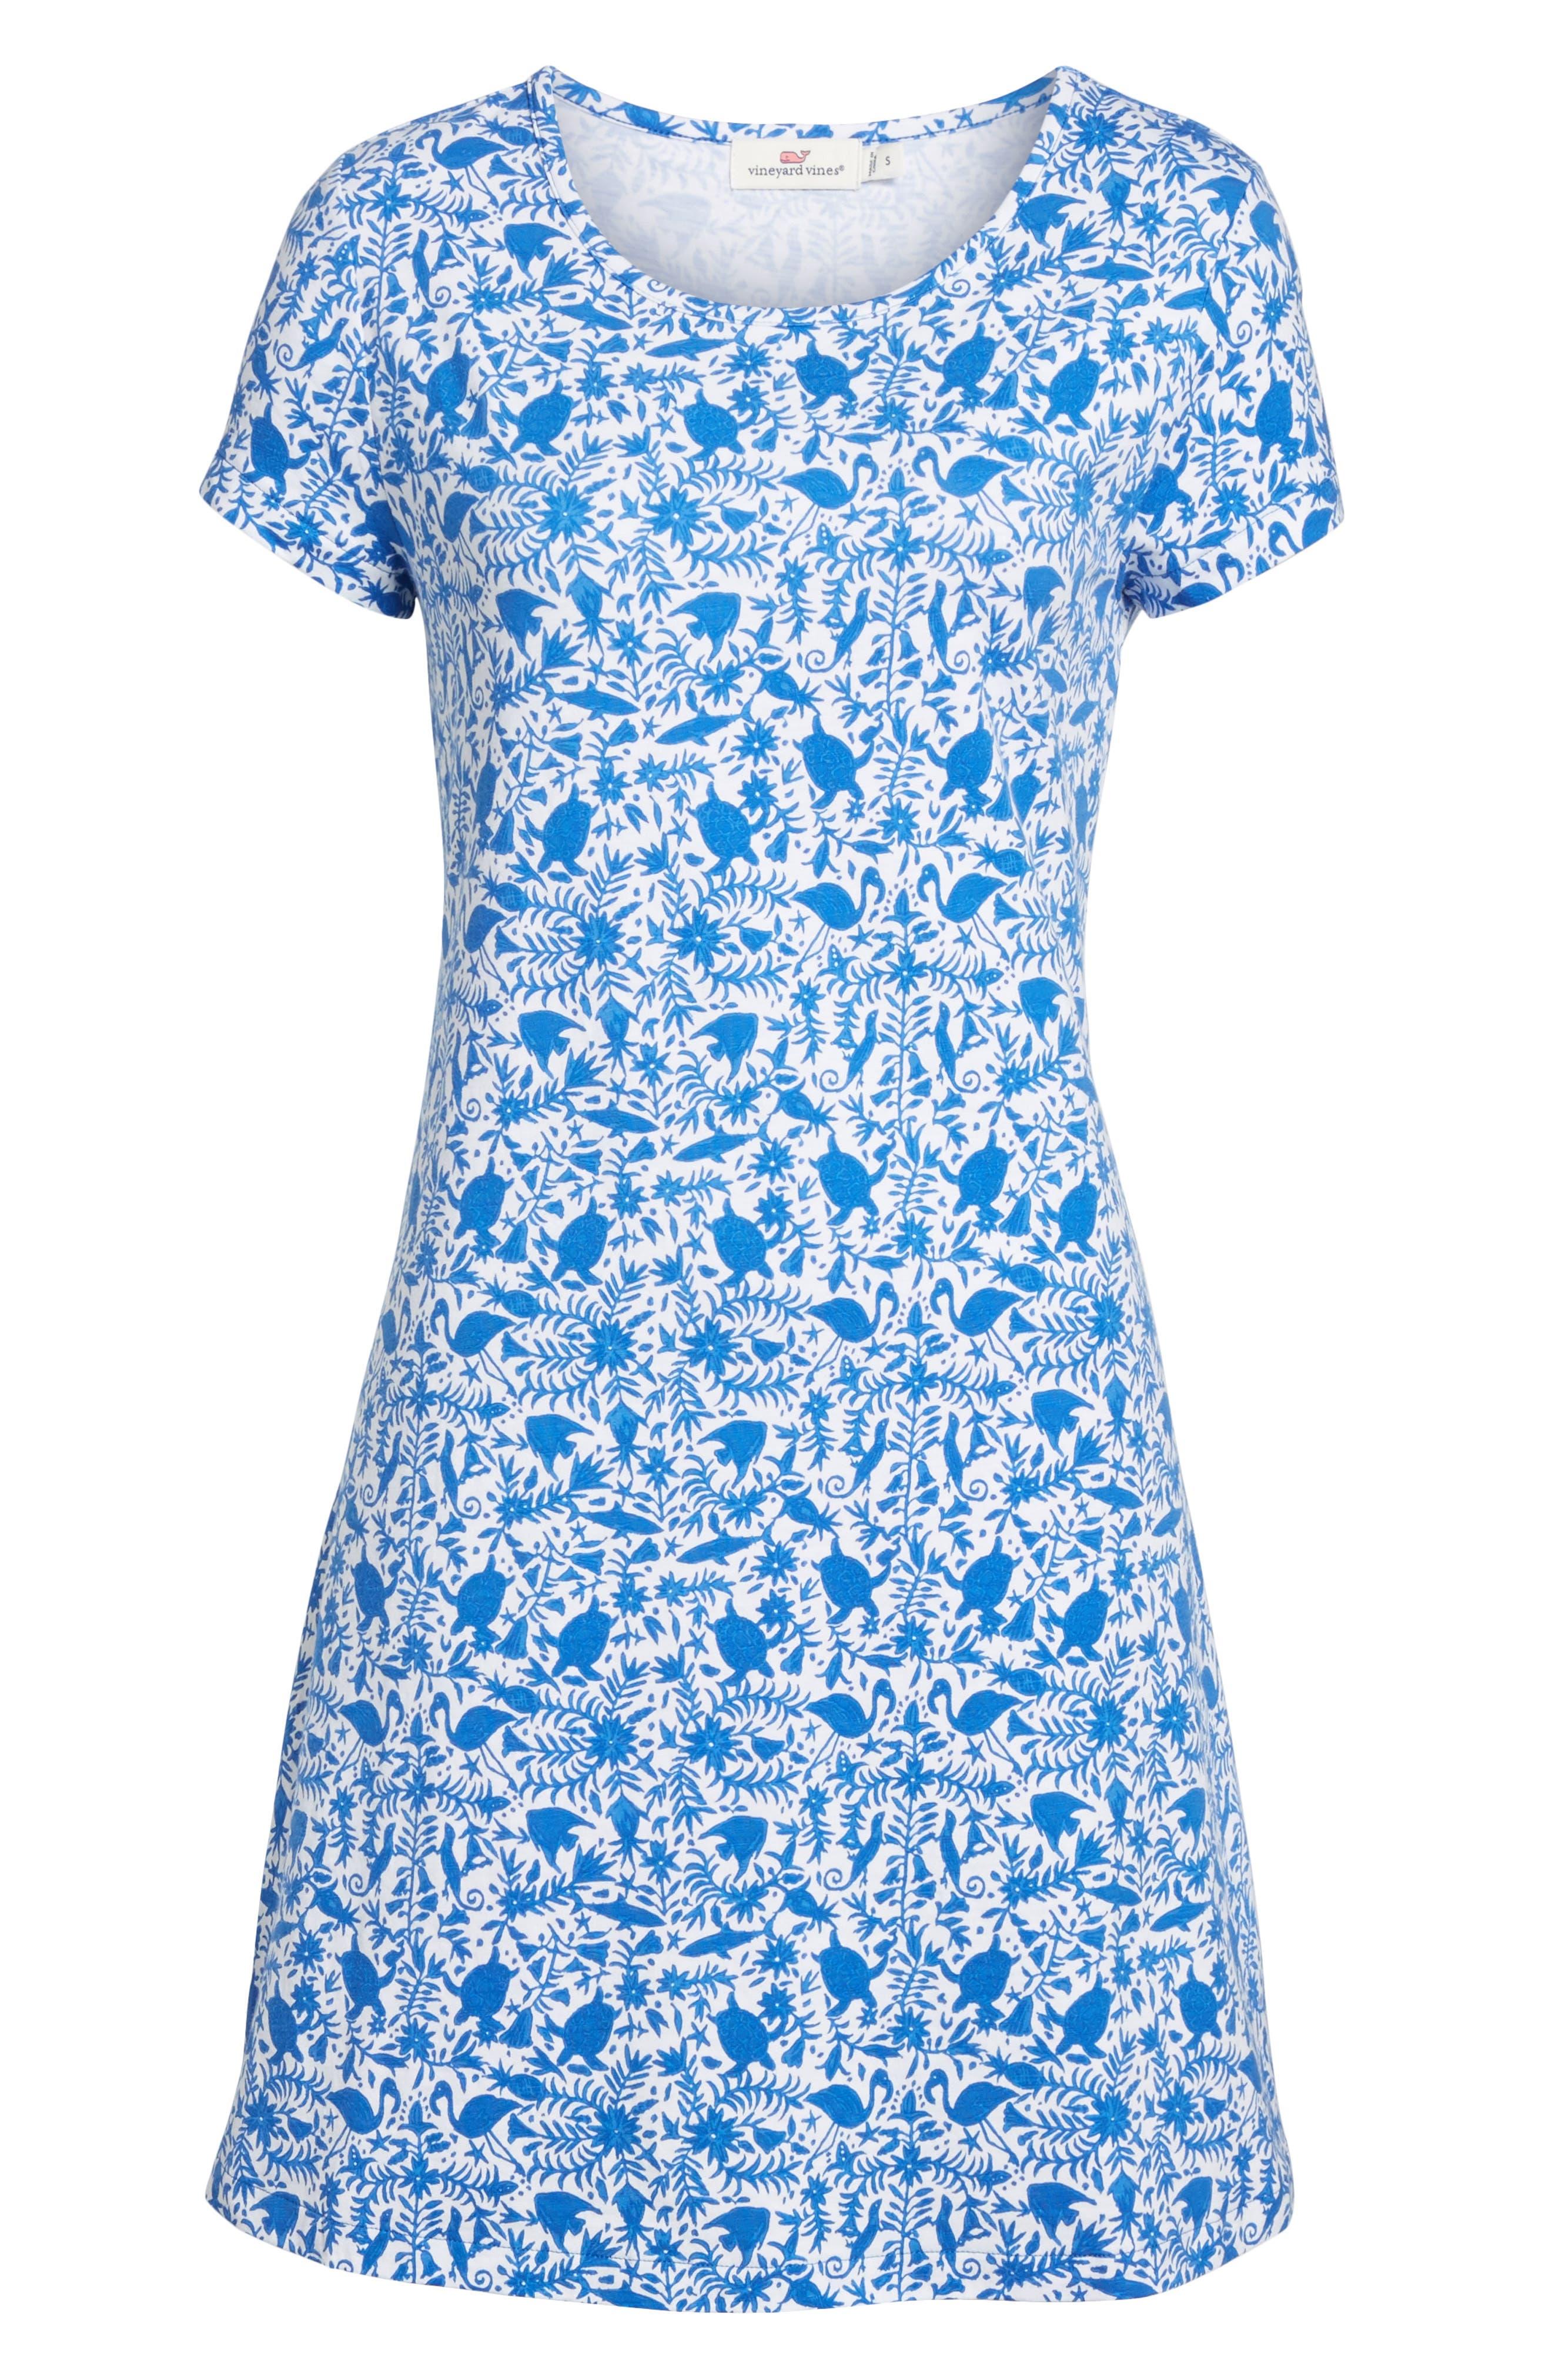 Bahamas Otomi Print Stretch Cotton Dress,                             Alternate thumbnail 6, color,                             413